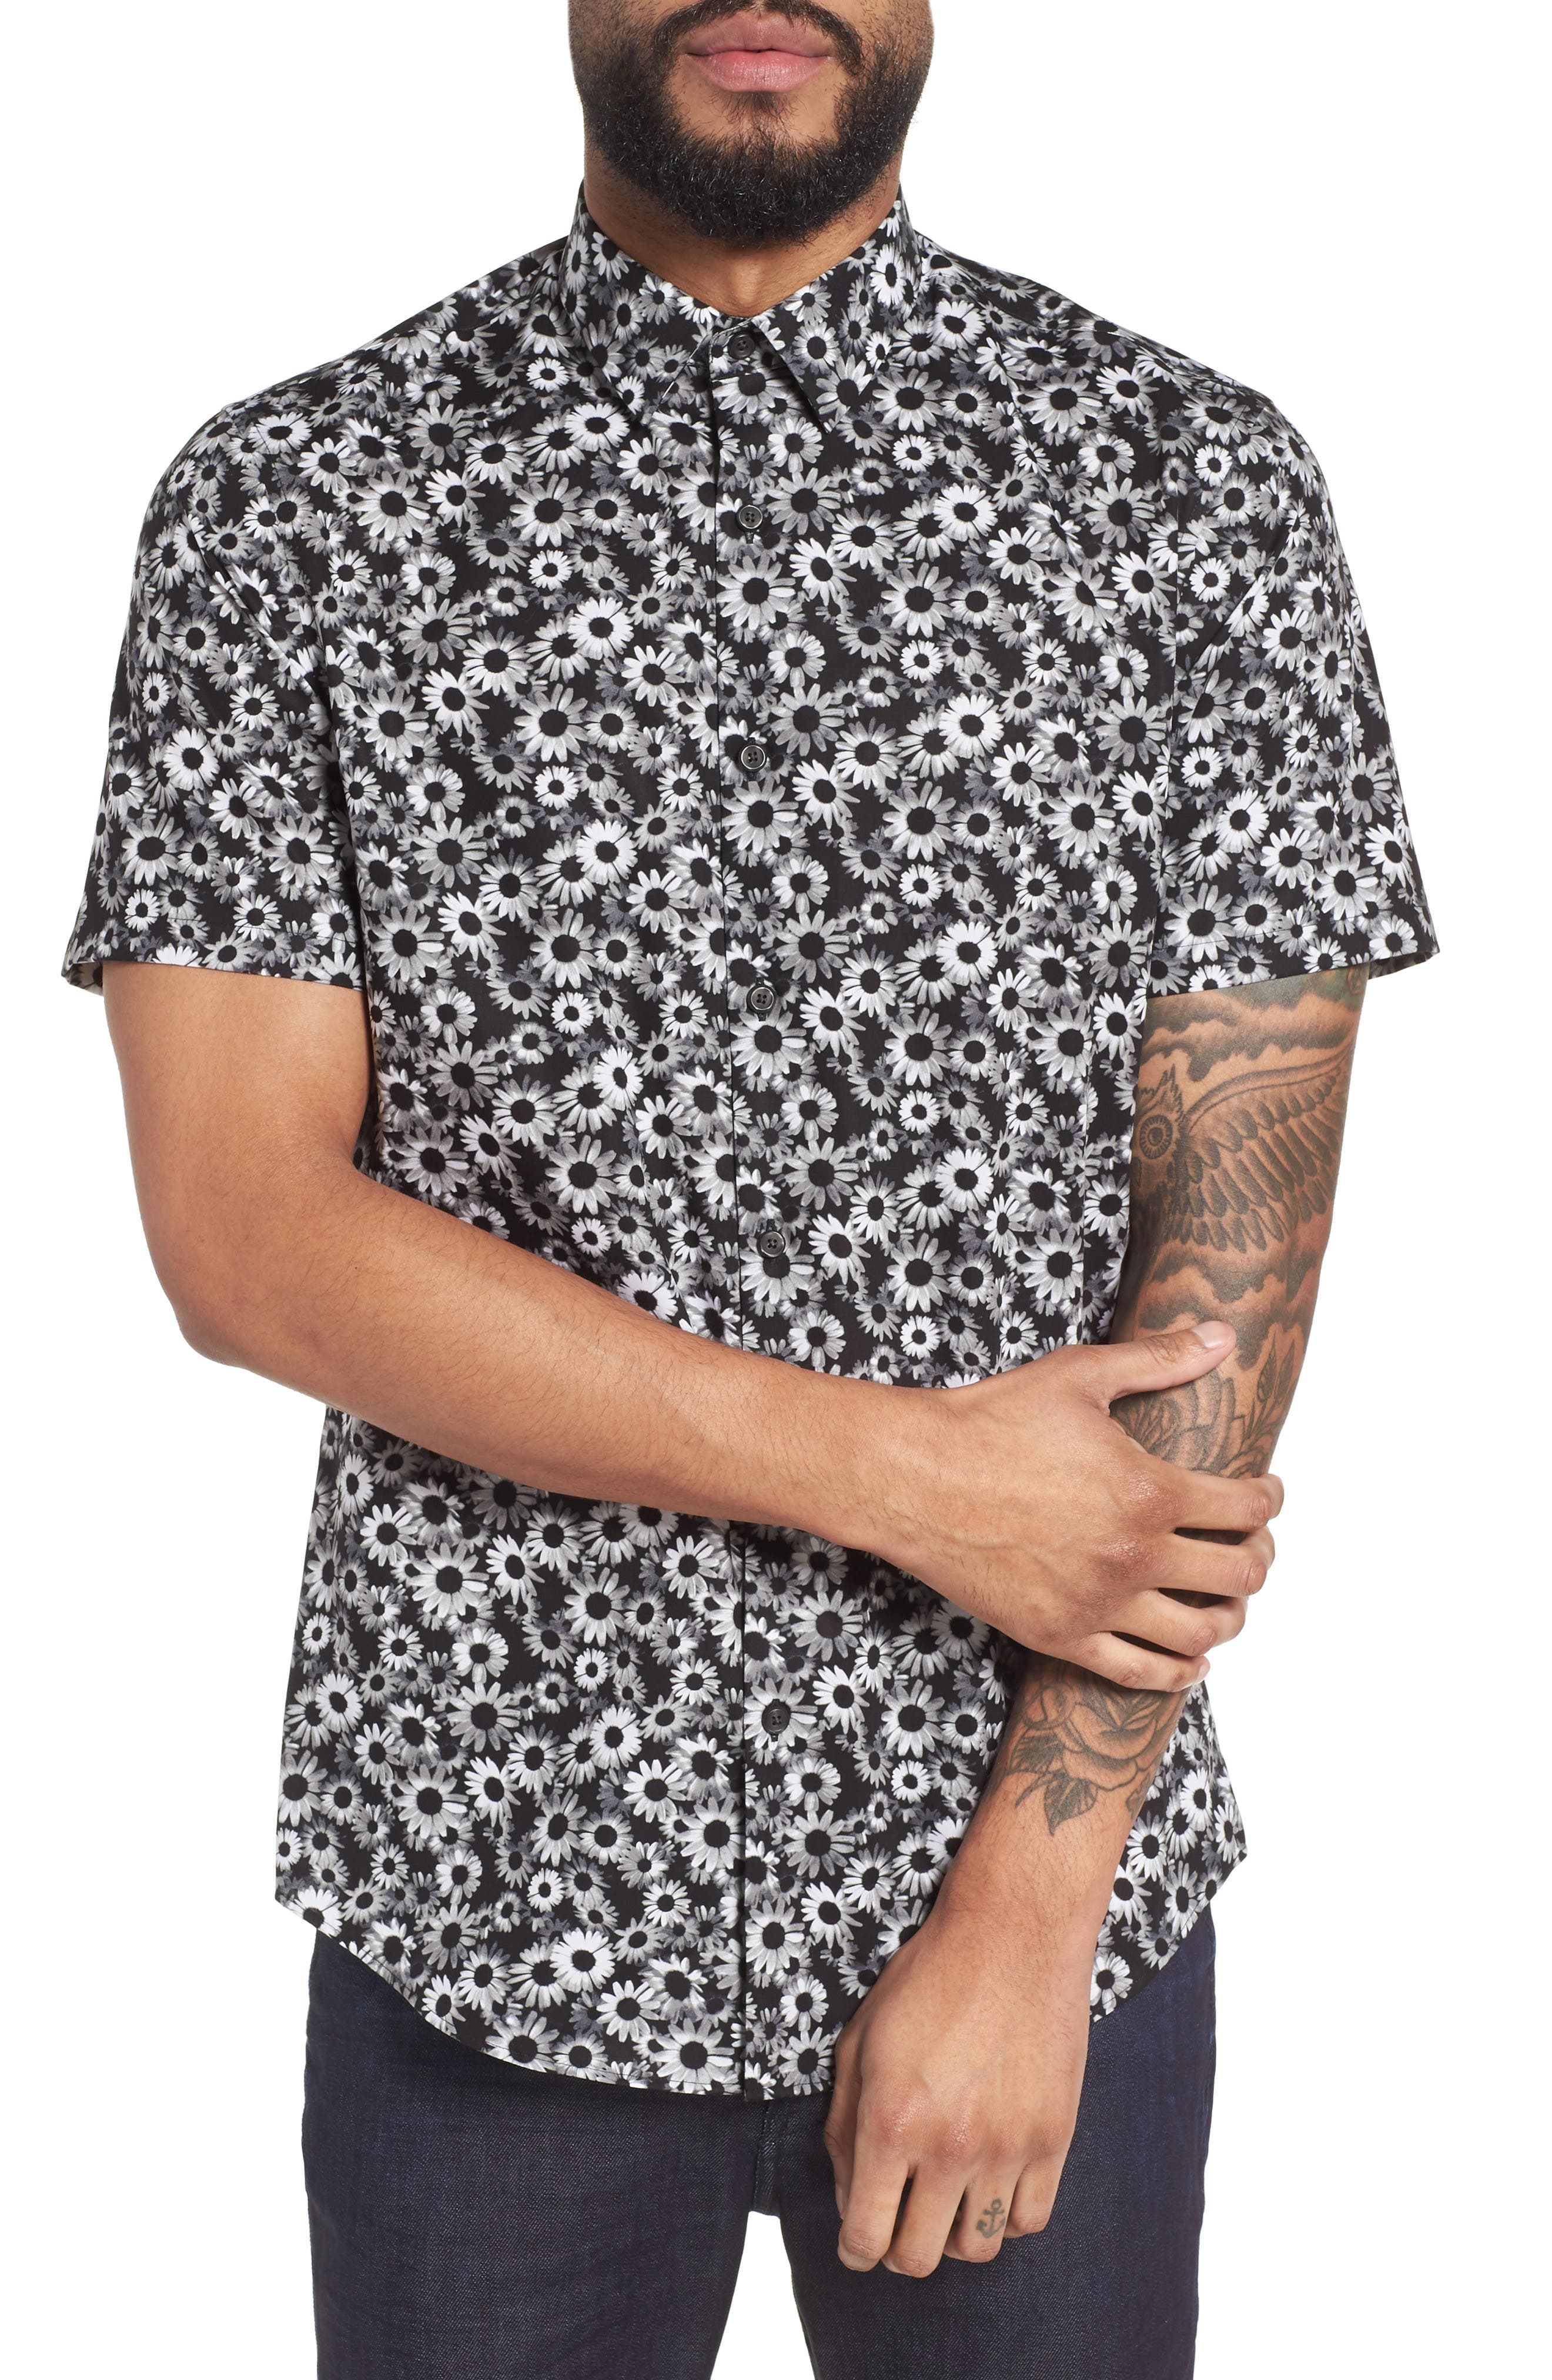 Floral Sport Shirt,                             Main thumbnail 1, color,                             BLACK WHITE DAISY FLORAL